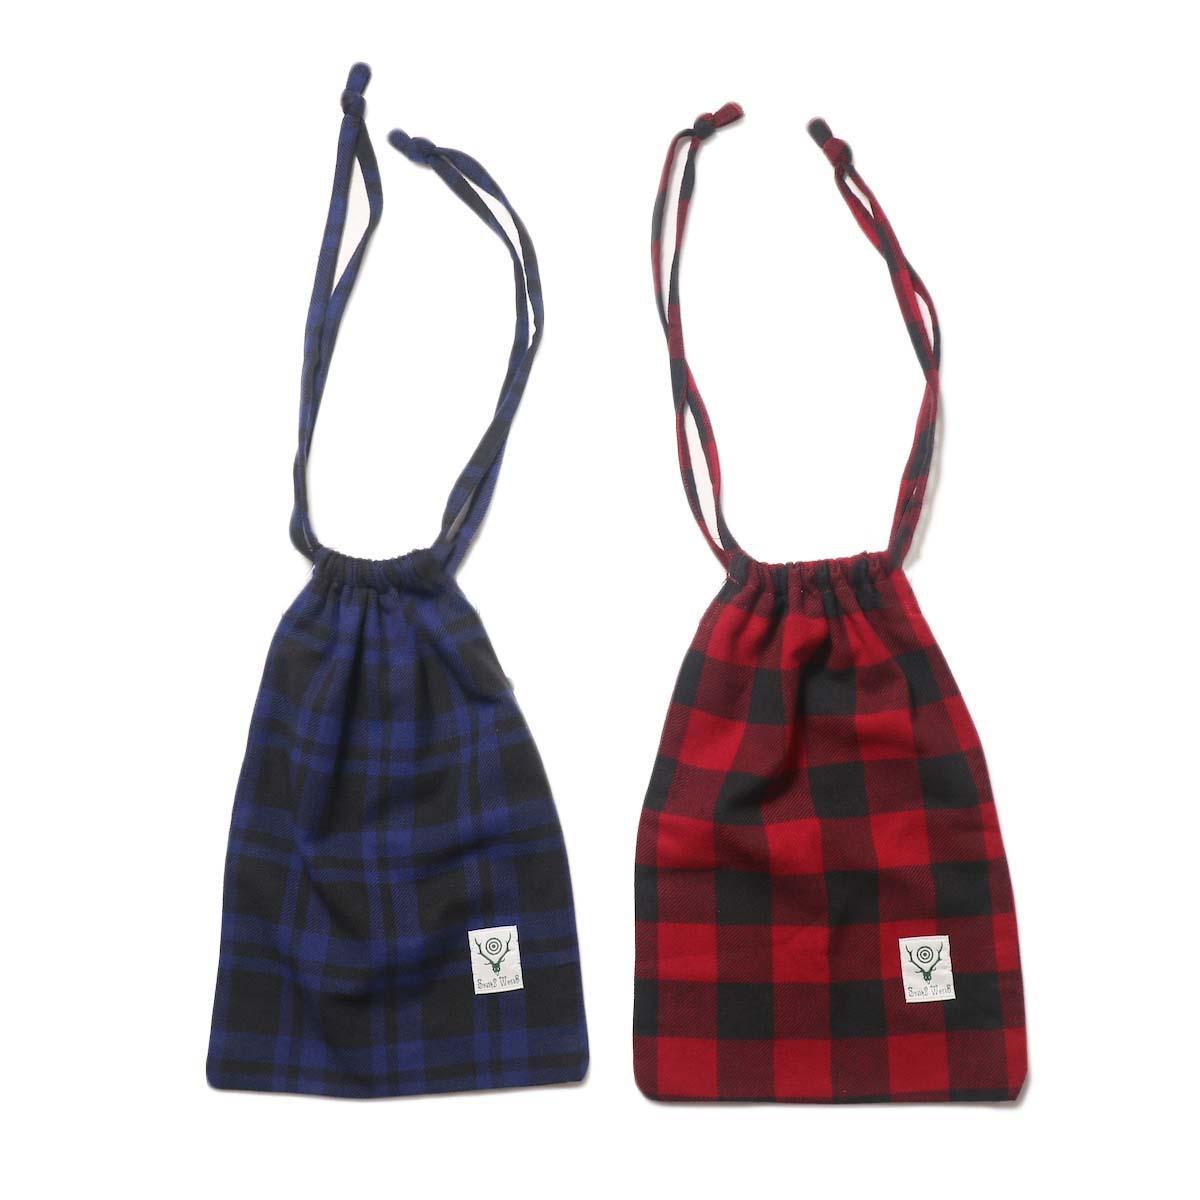 South2 West8 / String Bag - Plaid Twill 左:BLUE/BLACK 右:RED/BLACK